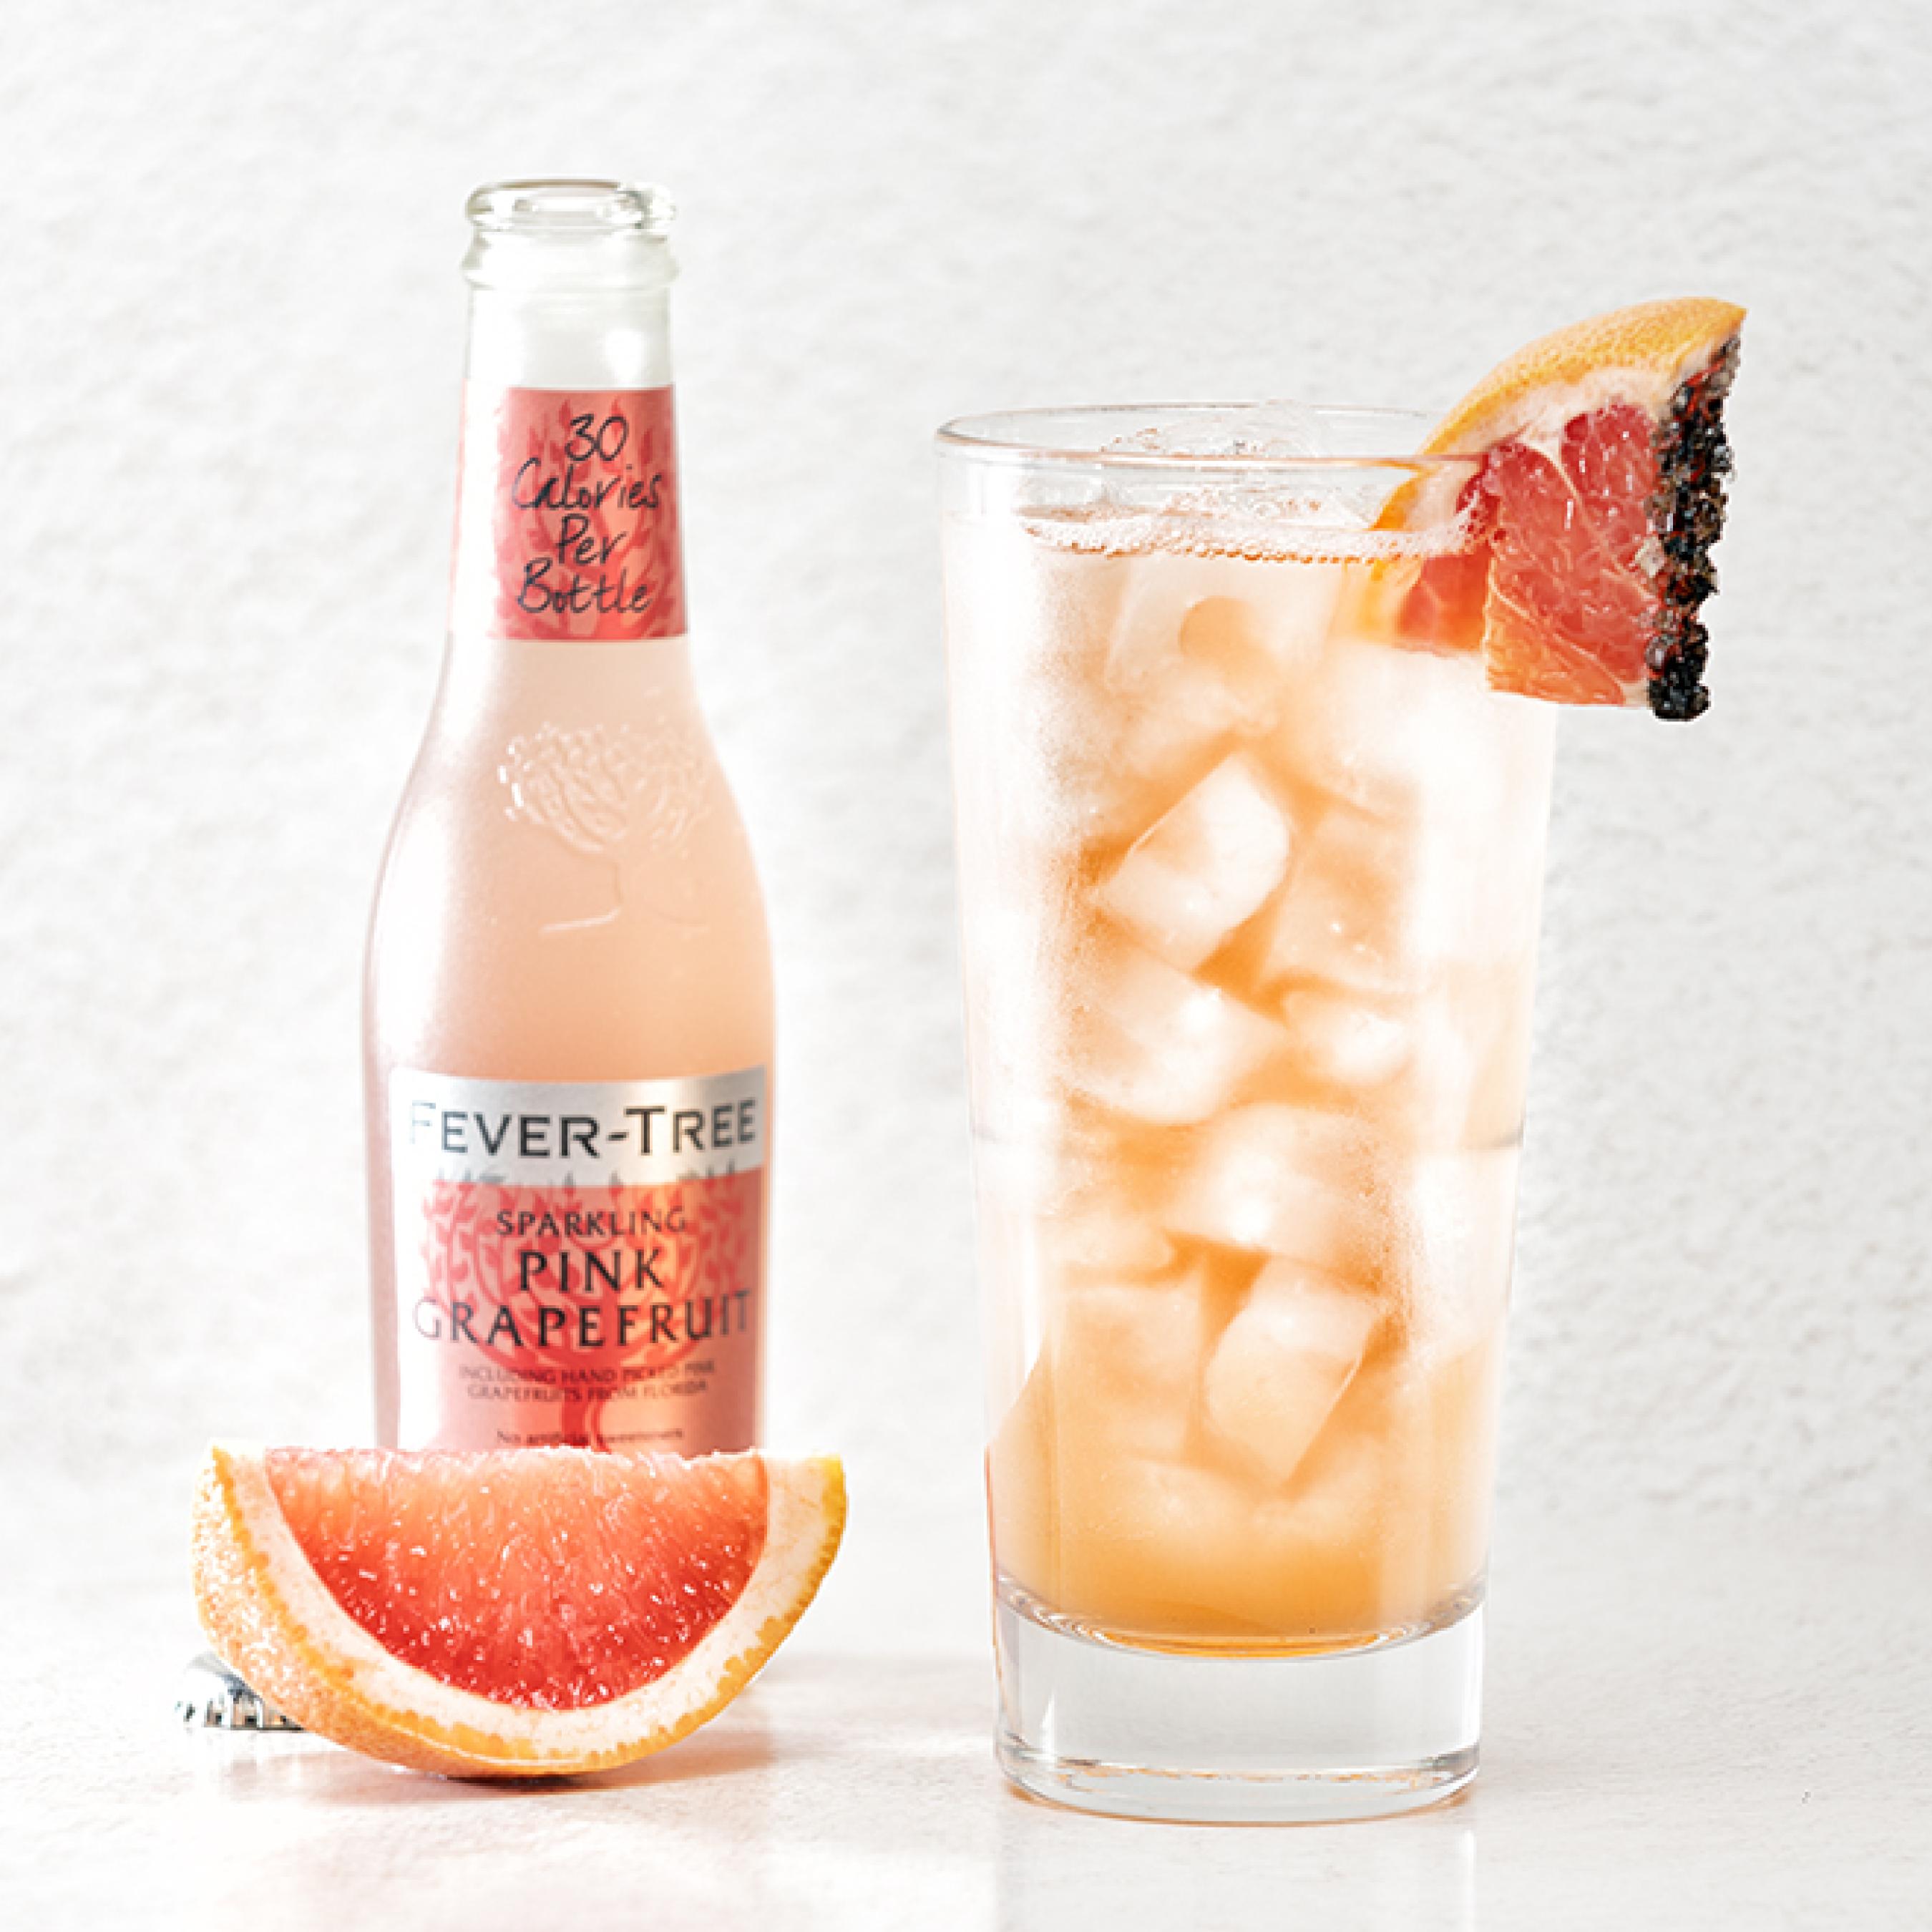 Ruby & Rose Cocktail: Ketel One Botanical Grapefruit & Rose, Aperol, simple syrup, lemon, Fever Tree Grapefruit Soda, grapefruit, black Hawaiian sea salt